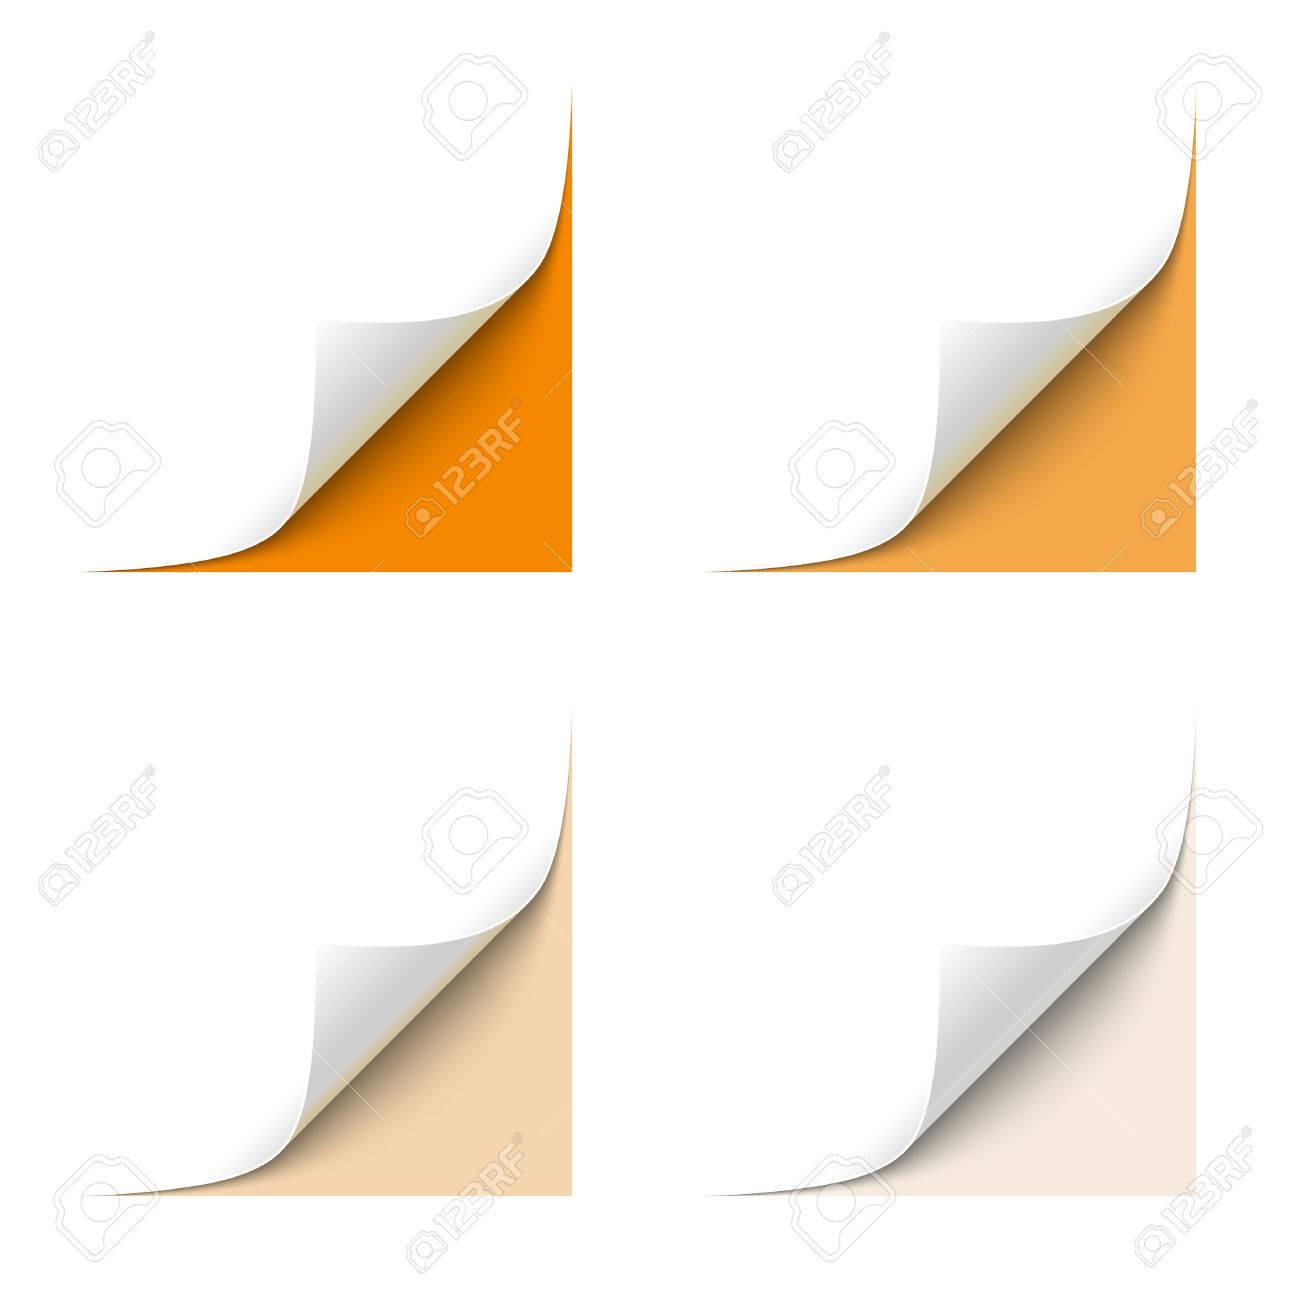 Curled White Paper Corner with Orange Background - 32846059